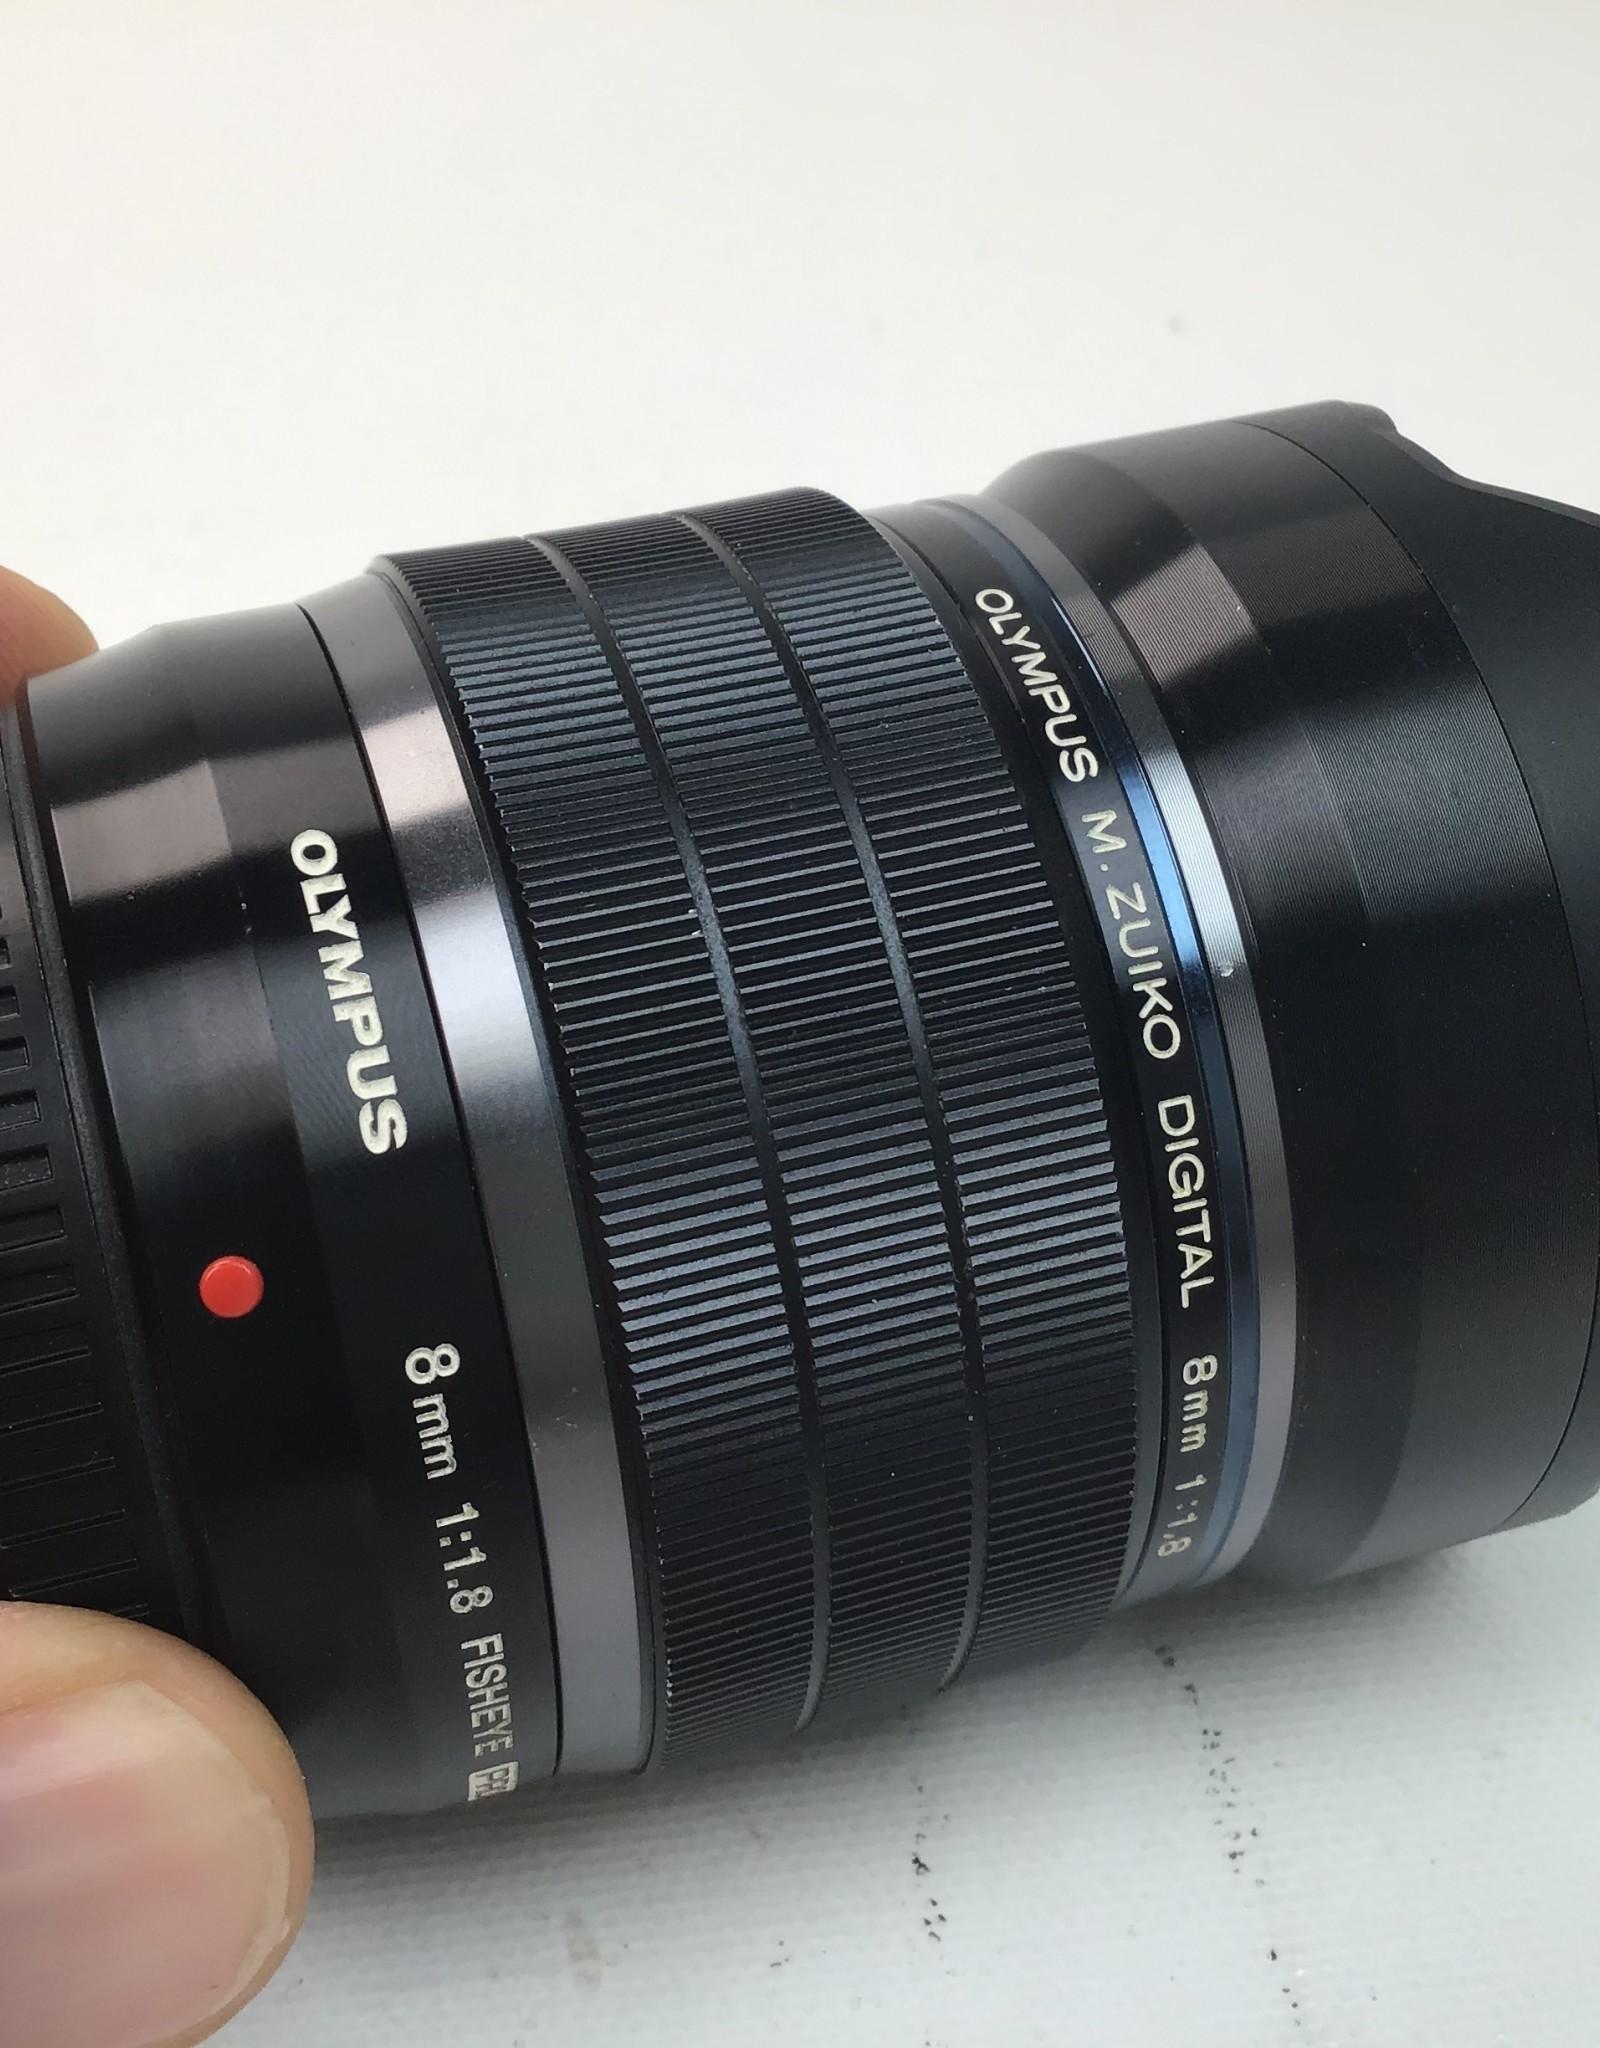 OLYMPUS Olympus M.Zuiko Digital 8mm f:1.8 Fisheye PRO lens Used Good